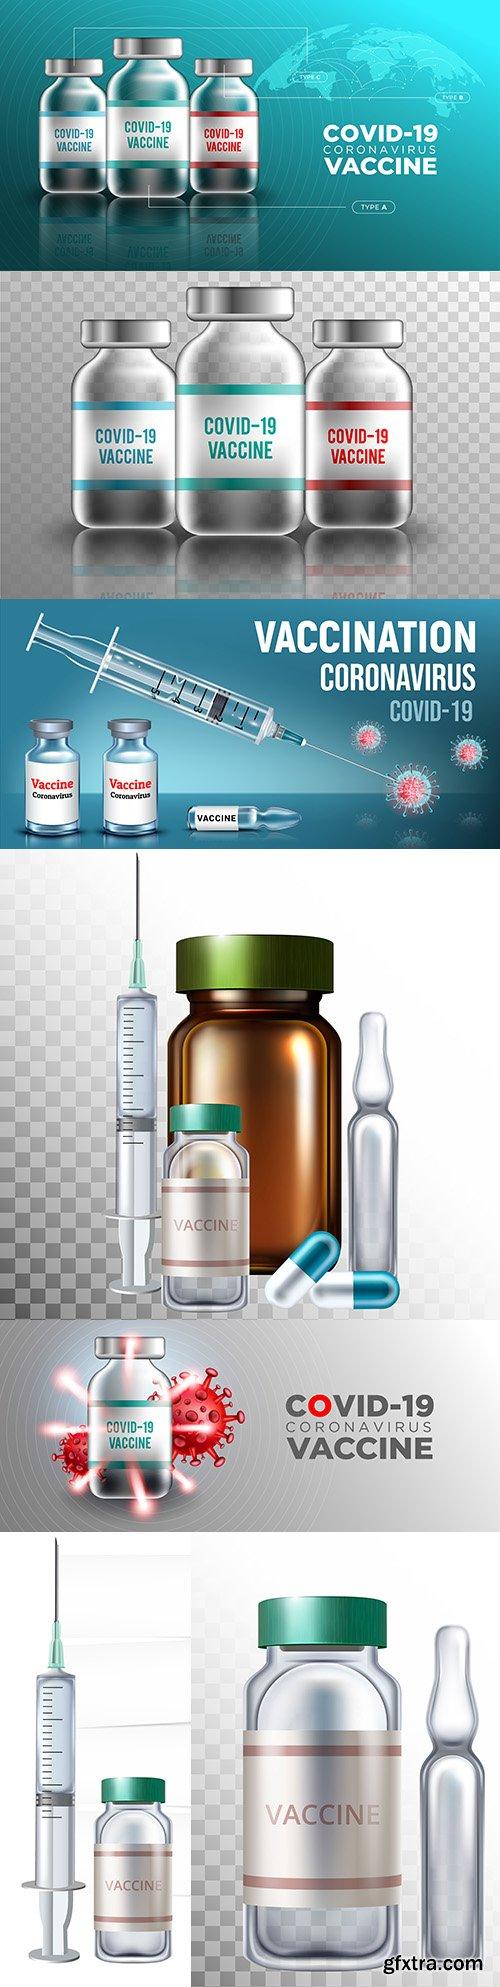 Vaccination against coronavirus covid-19 design banner